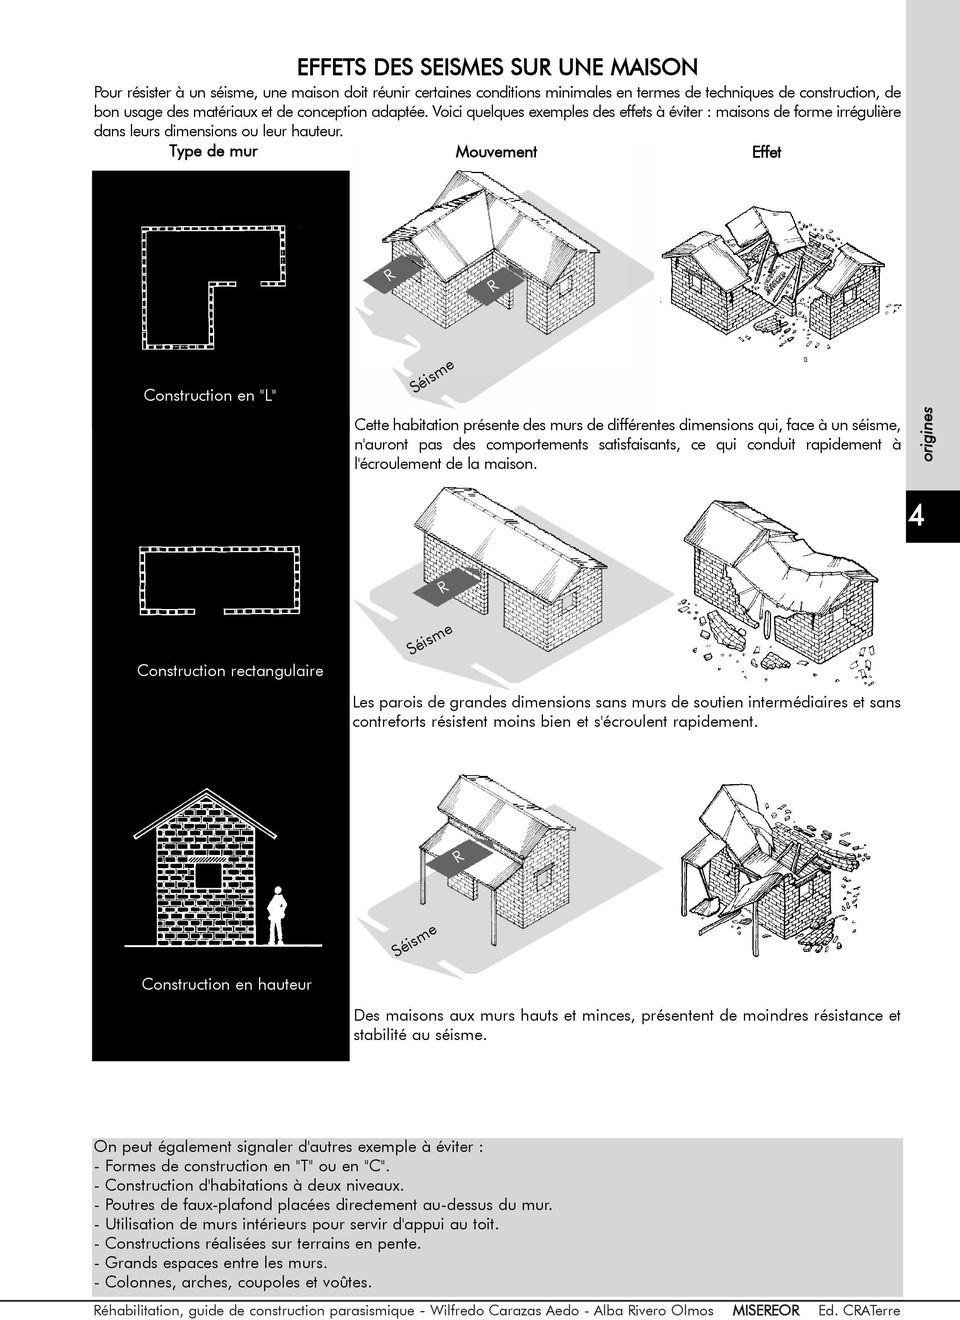 Mur De Bulles Pas Cher Meilleur De Images Guide De Construction Parasismique Arch Wilfredo Carazas Aedo